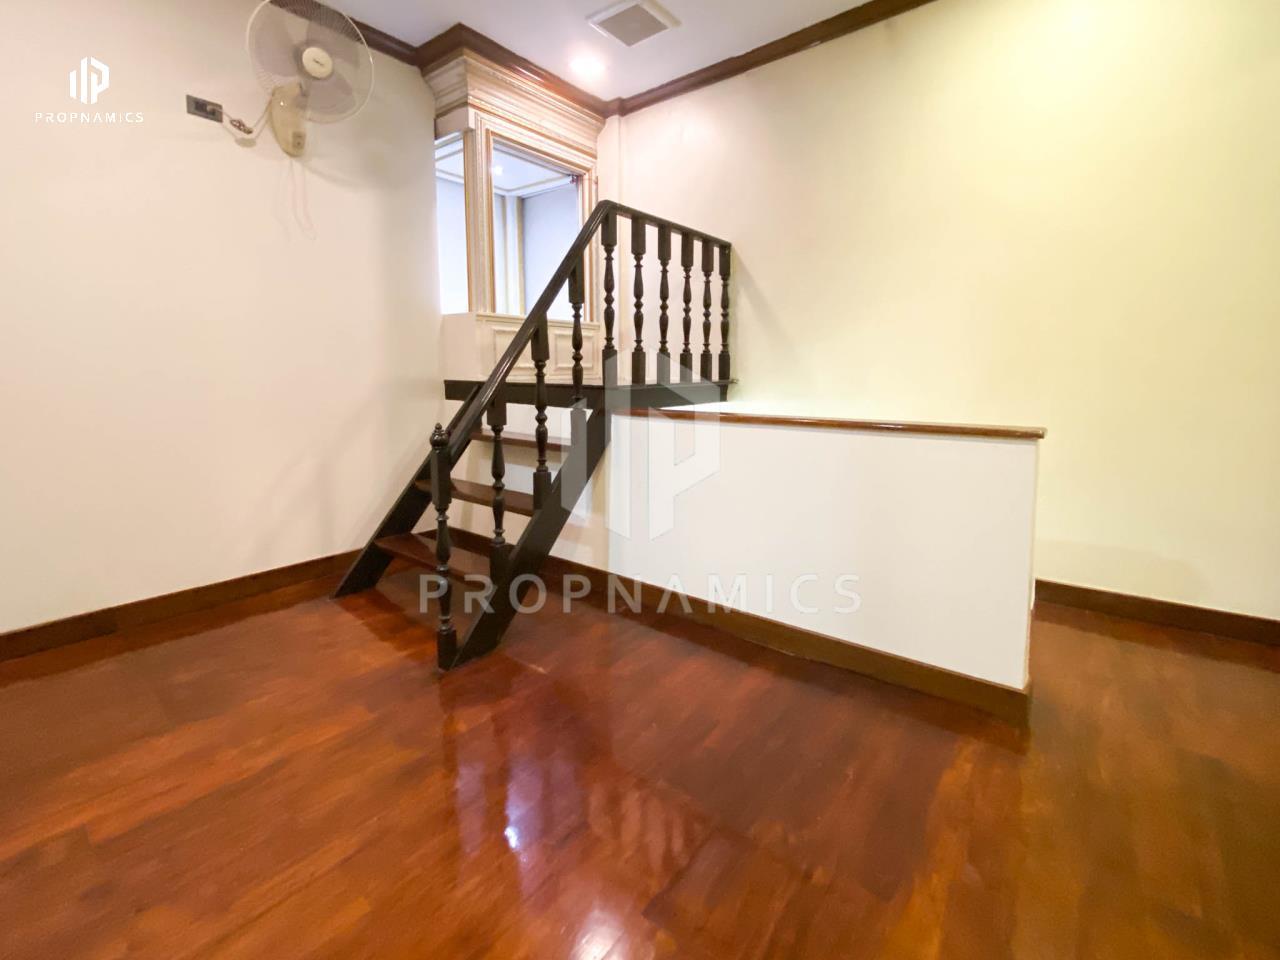 Propnamics Co., Ltd Agency's FOR RENT: SINGLE HOUSE IN SUKHUMVIT 26 18